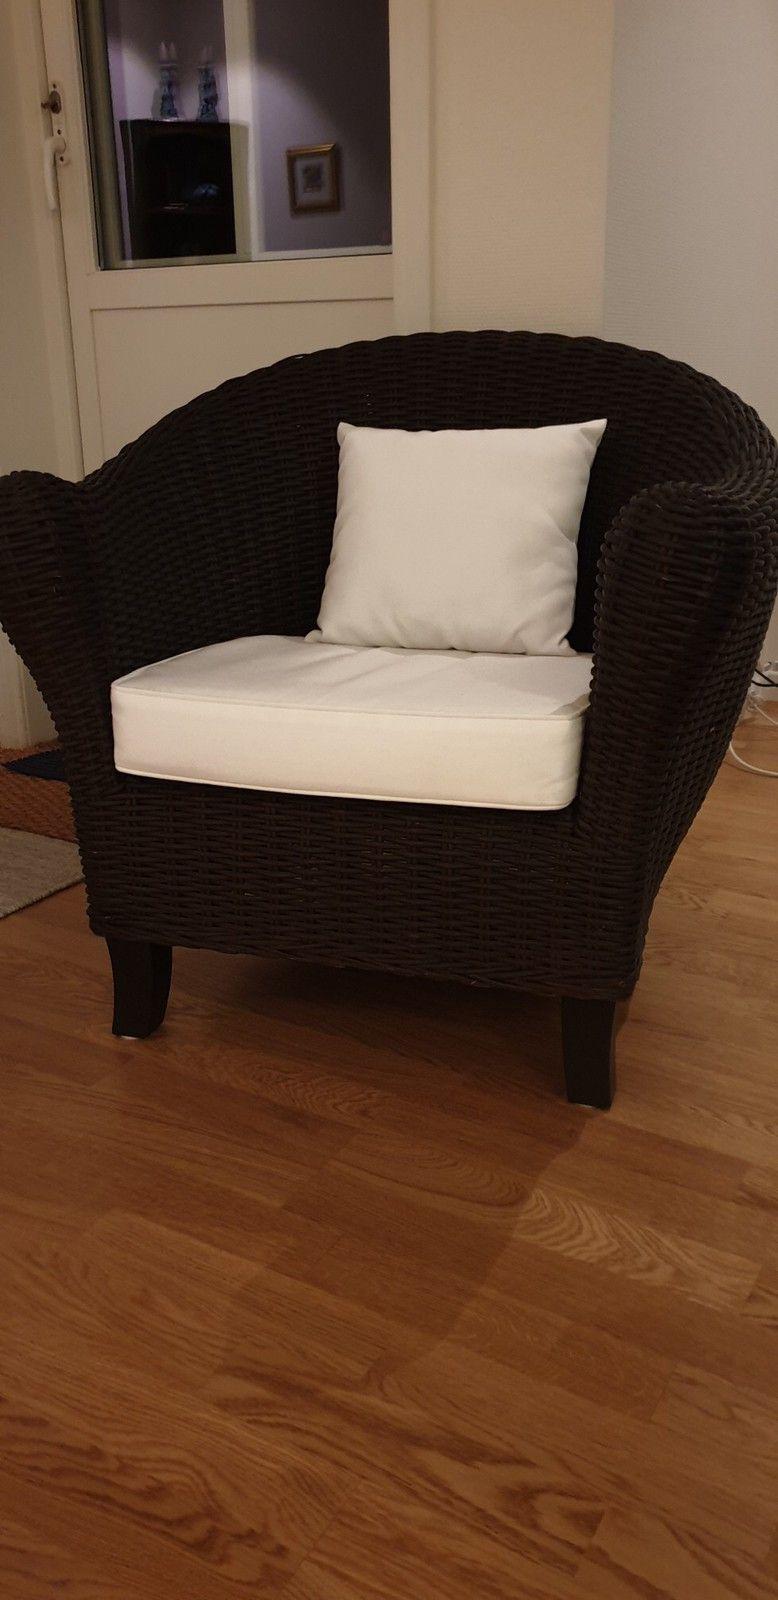 Ikea stol Martin | FINN.no